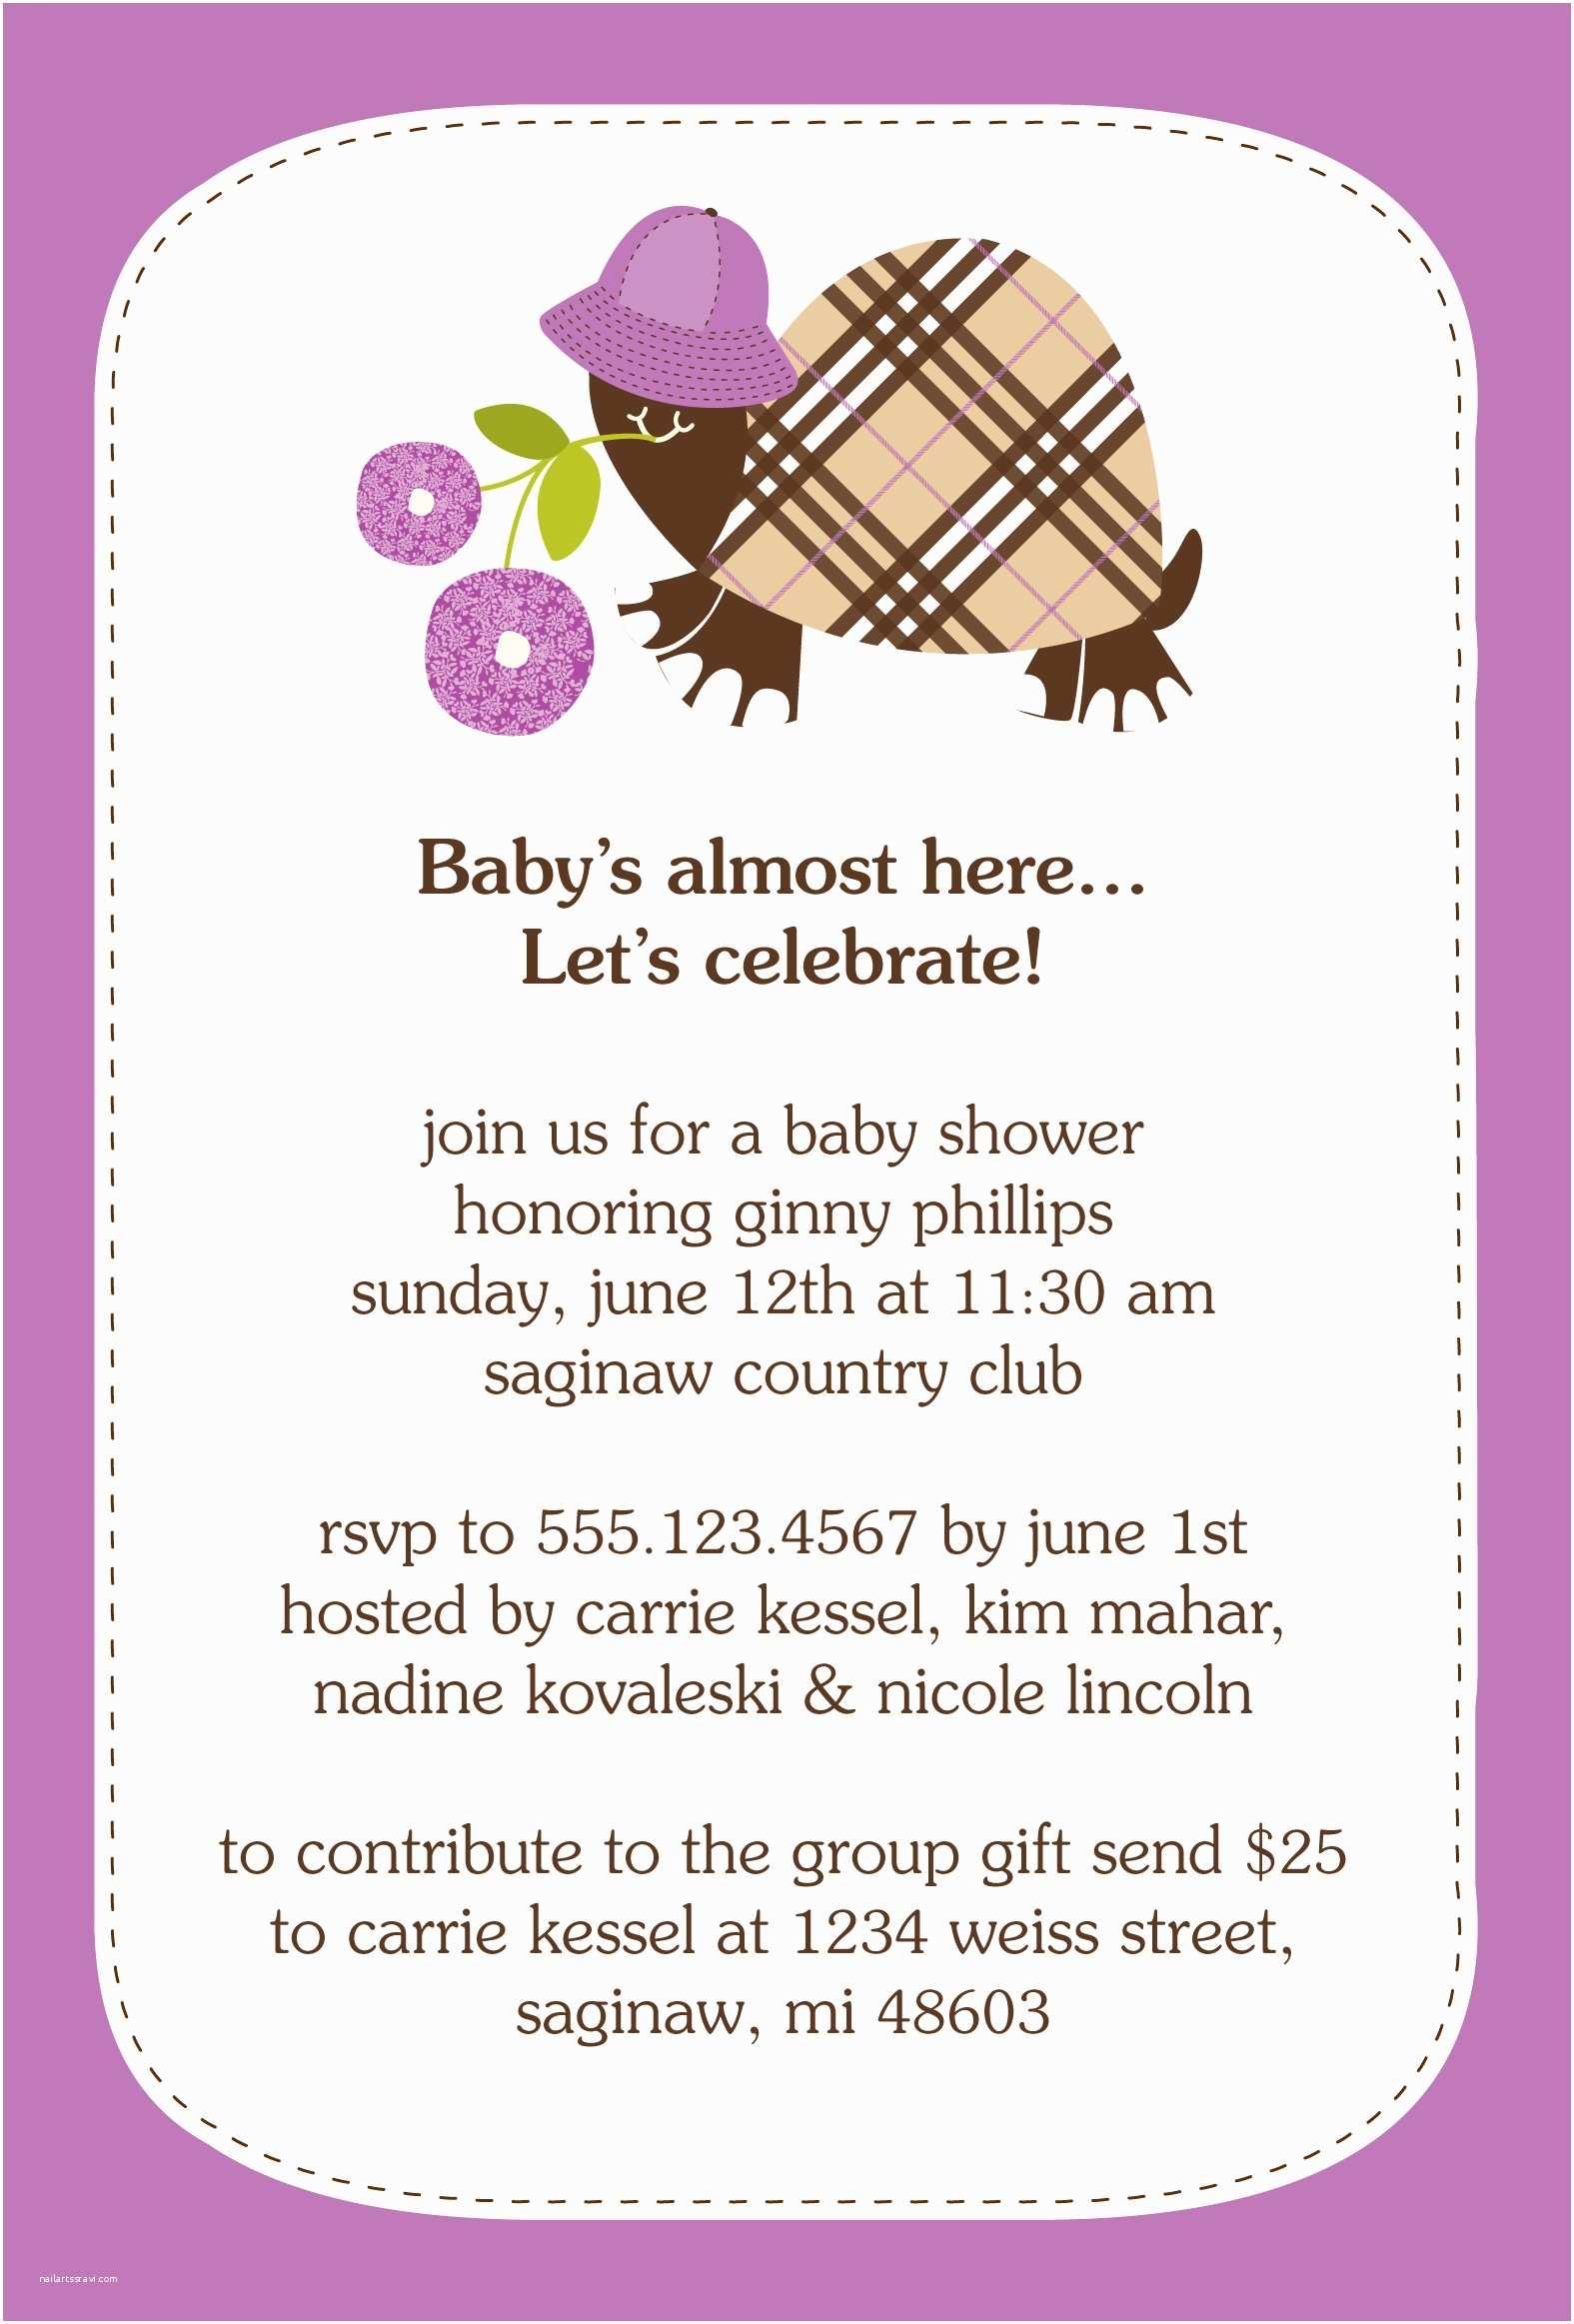 Samples Baby Shower Invitations Wording